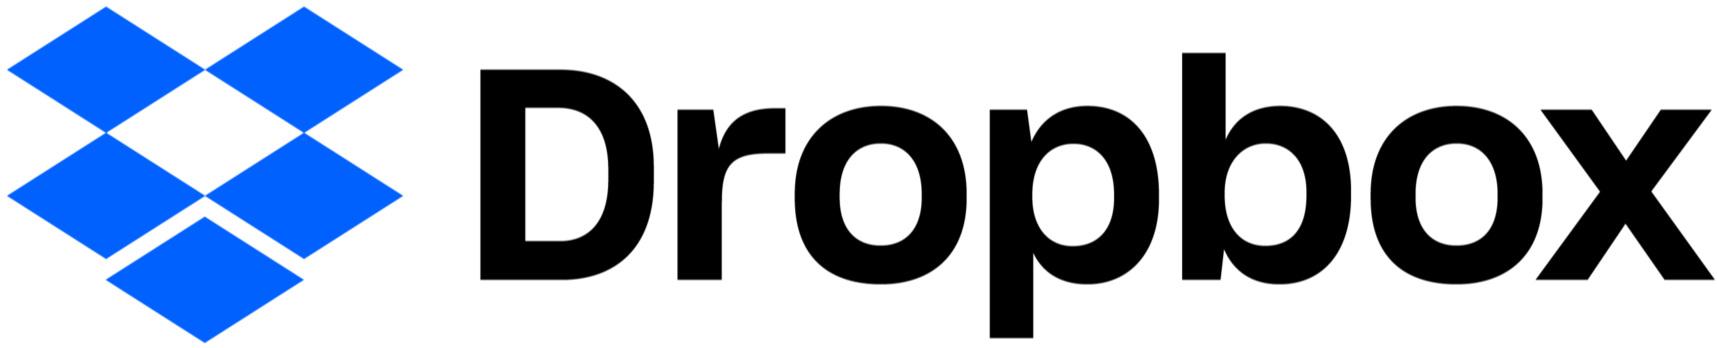 DropboxTransp.jpg